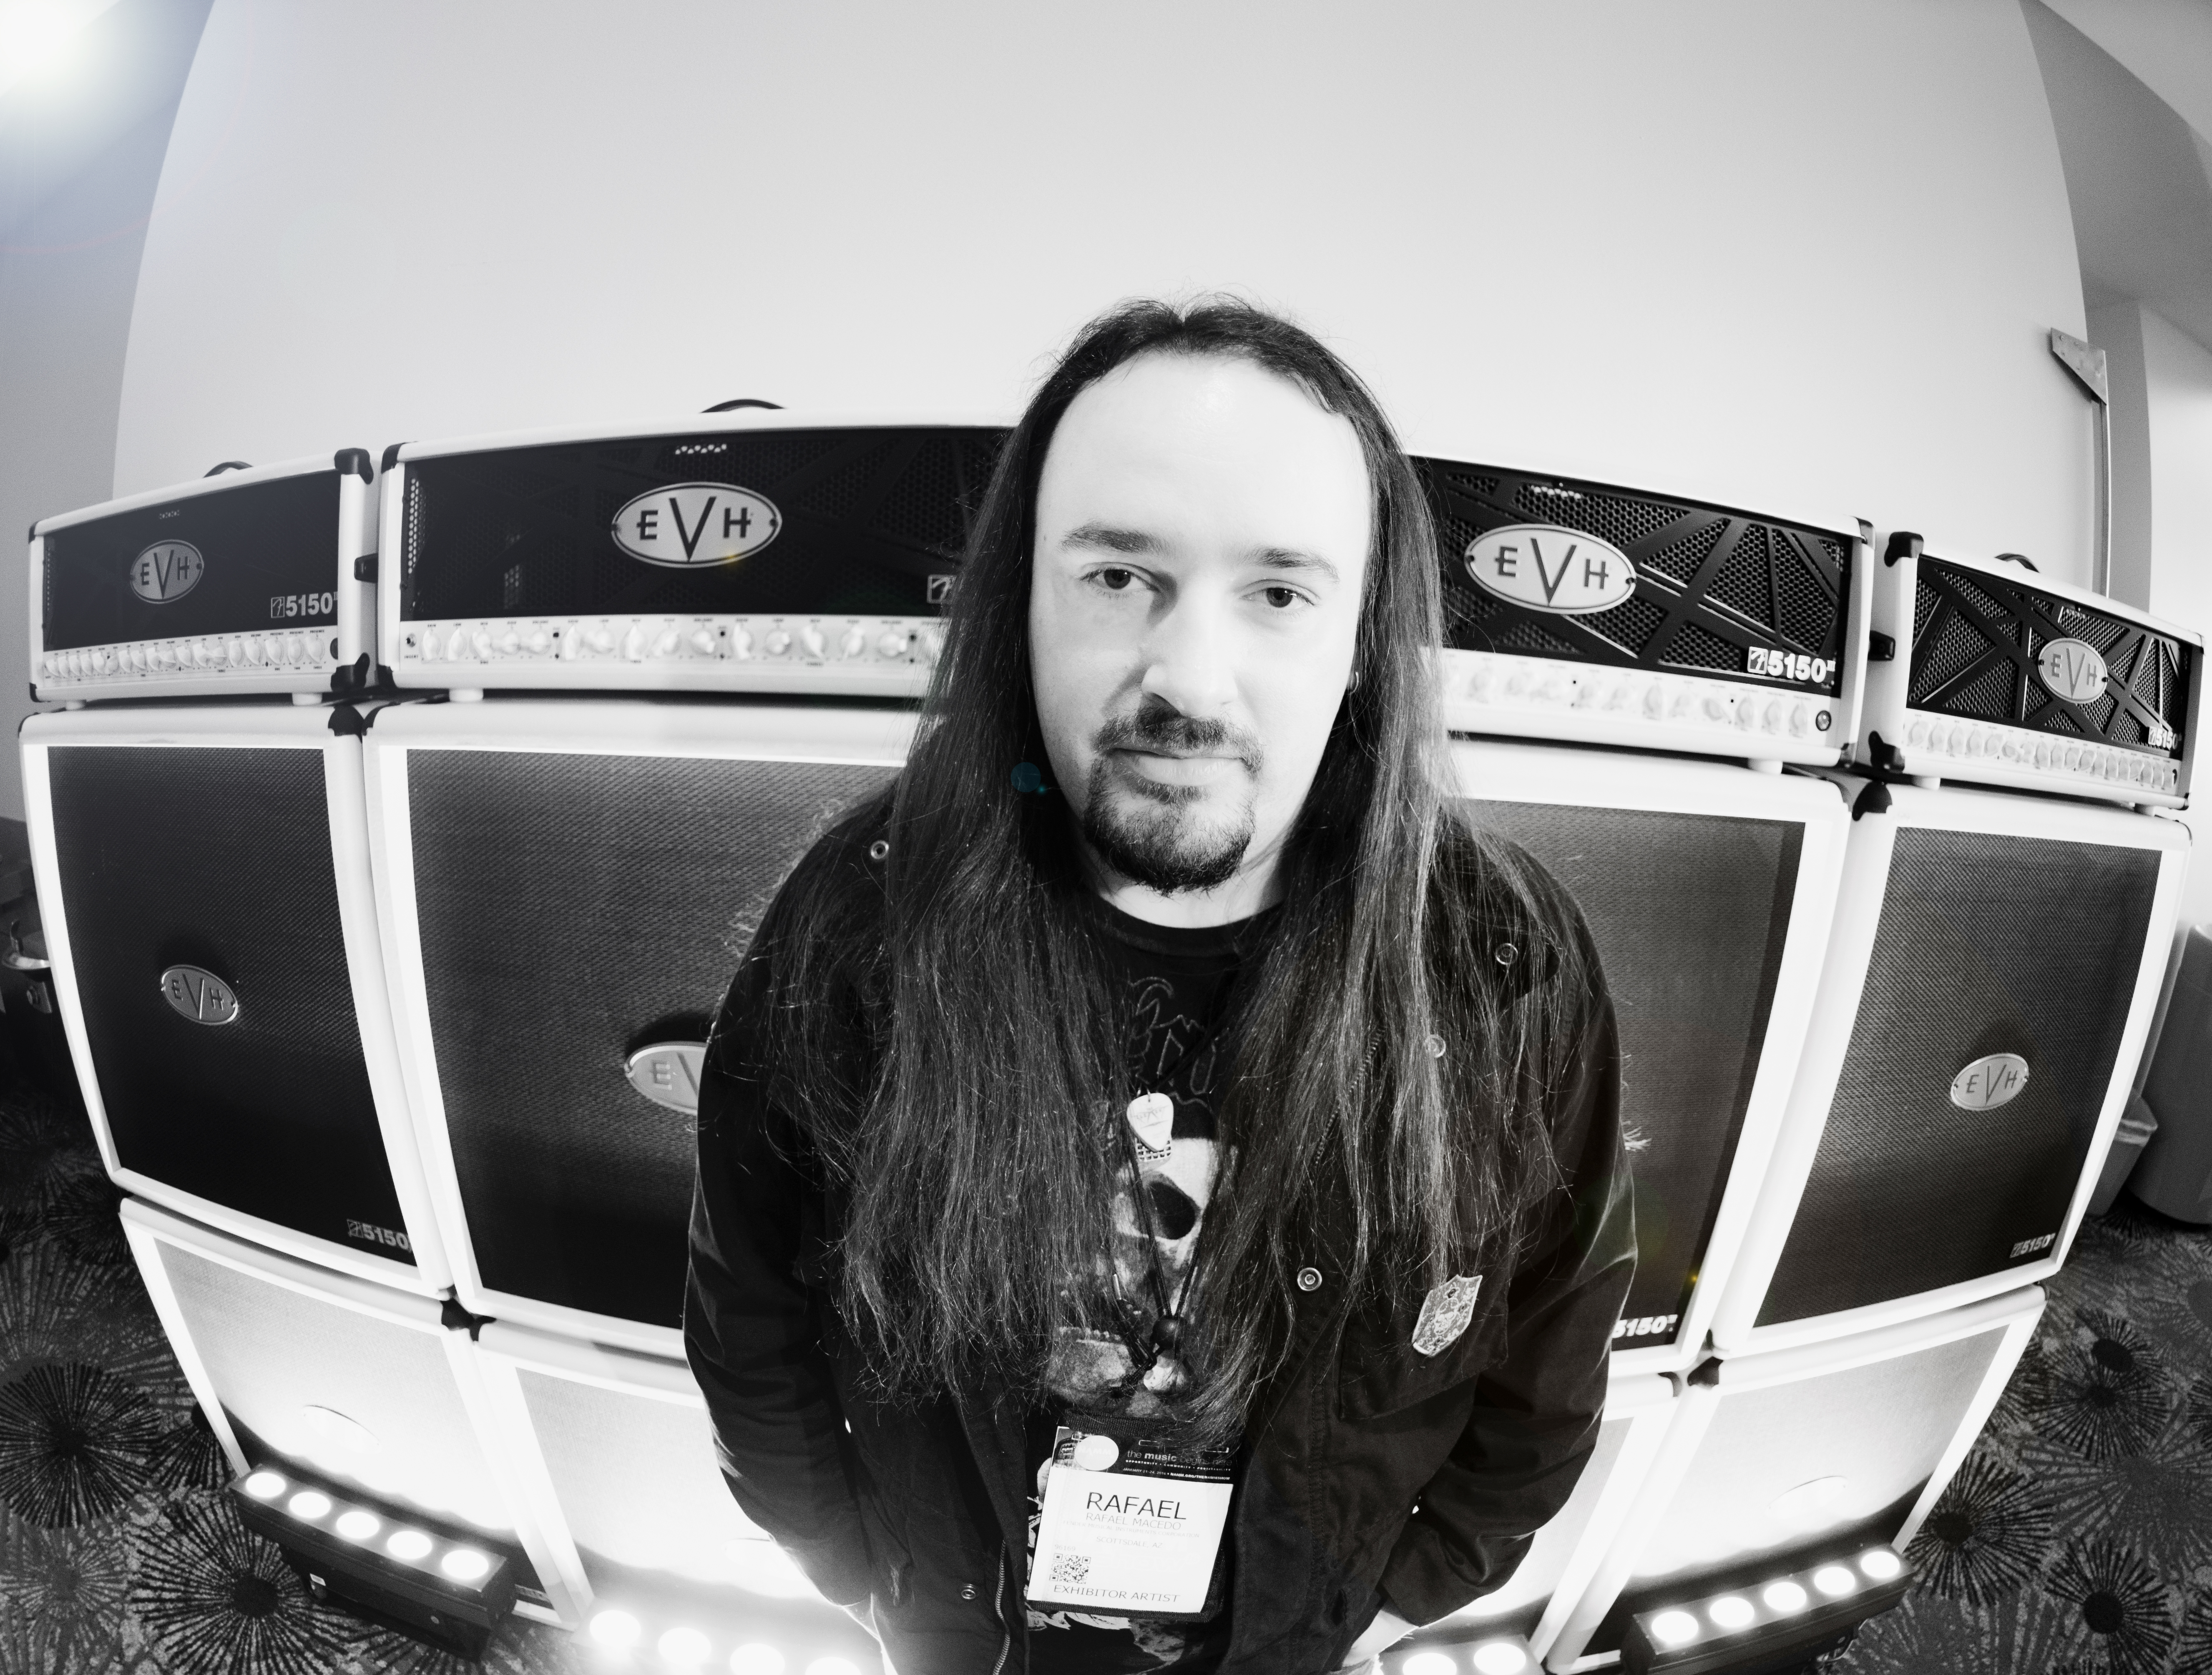 Rafael @ EVH Gear Booth